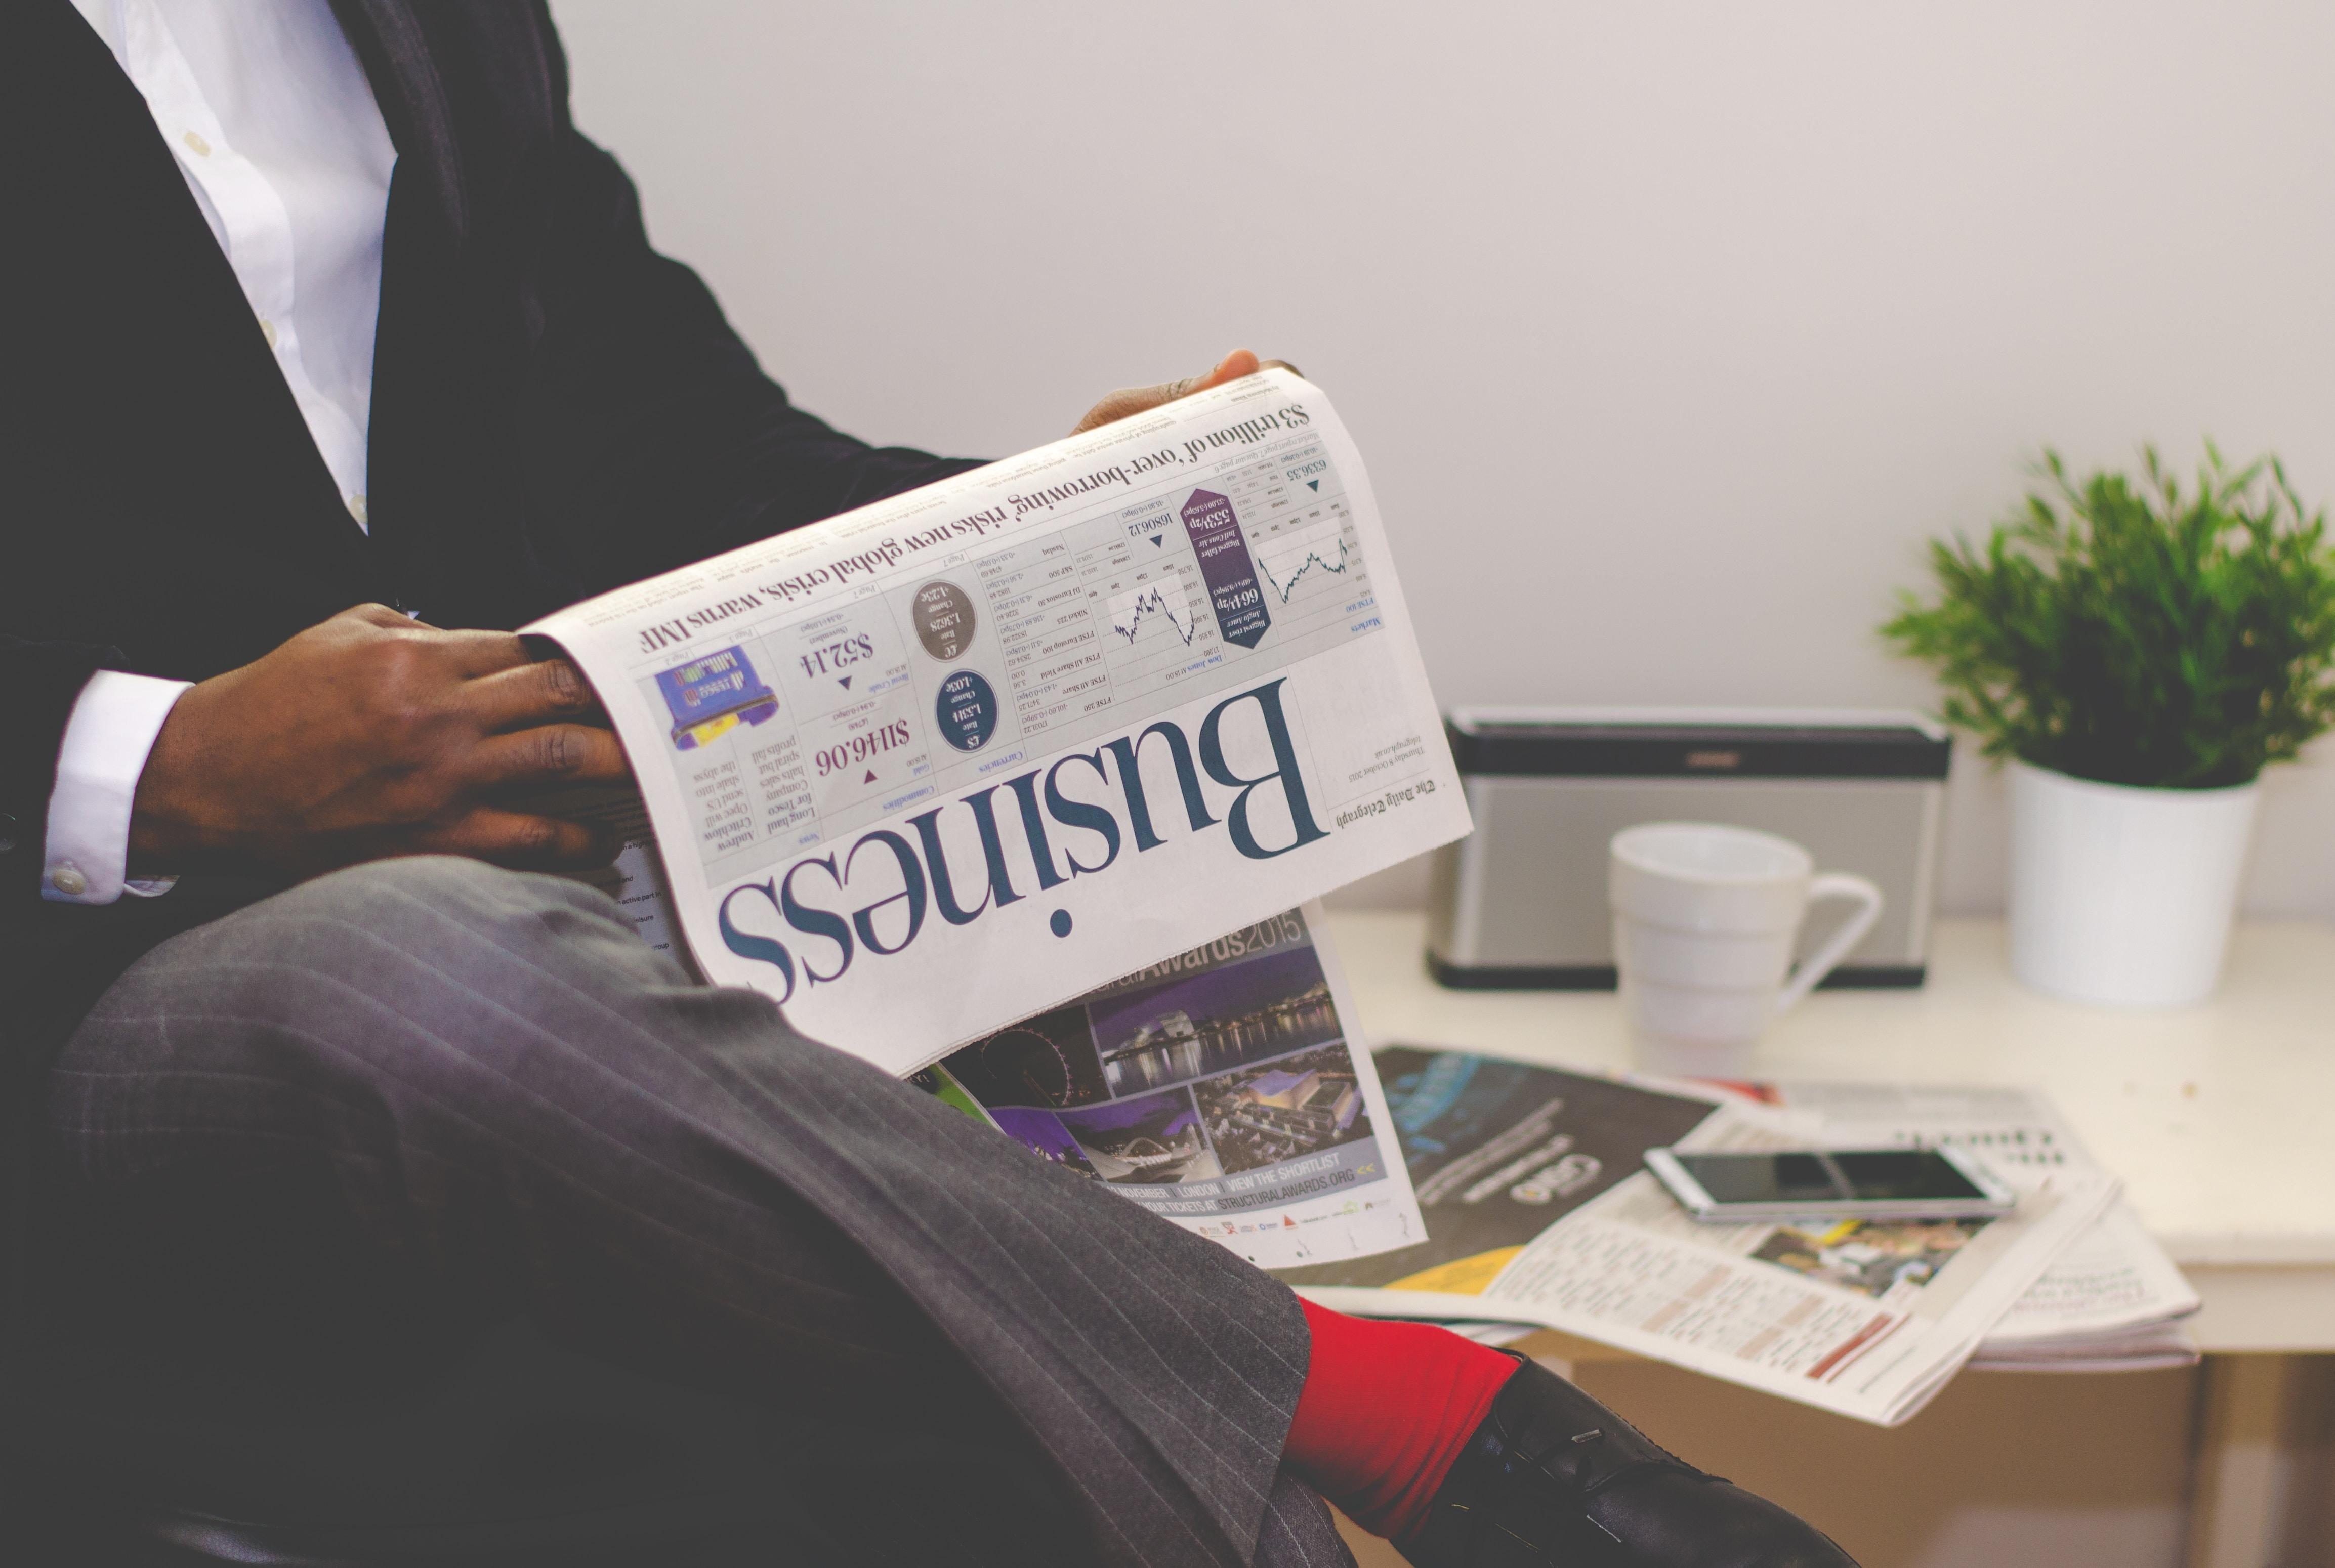 USA 걸스카우트 CEO였던 프랜시스 헤셀바인의 리더십 철학